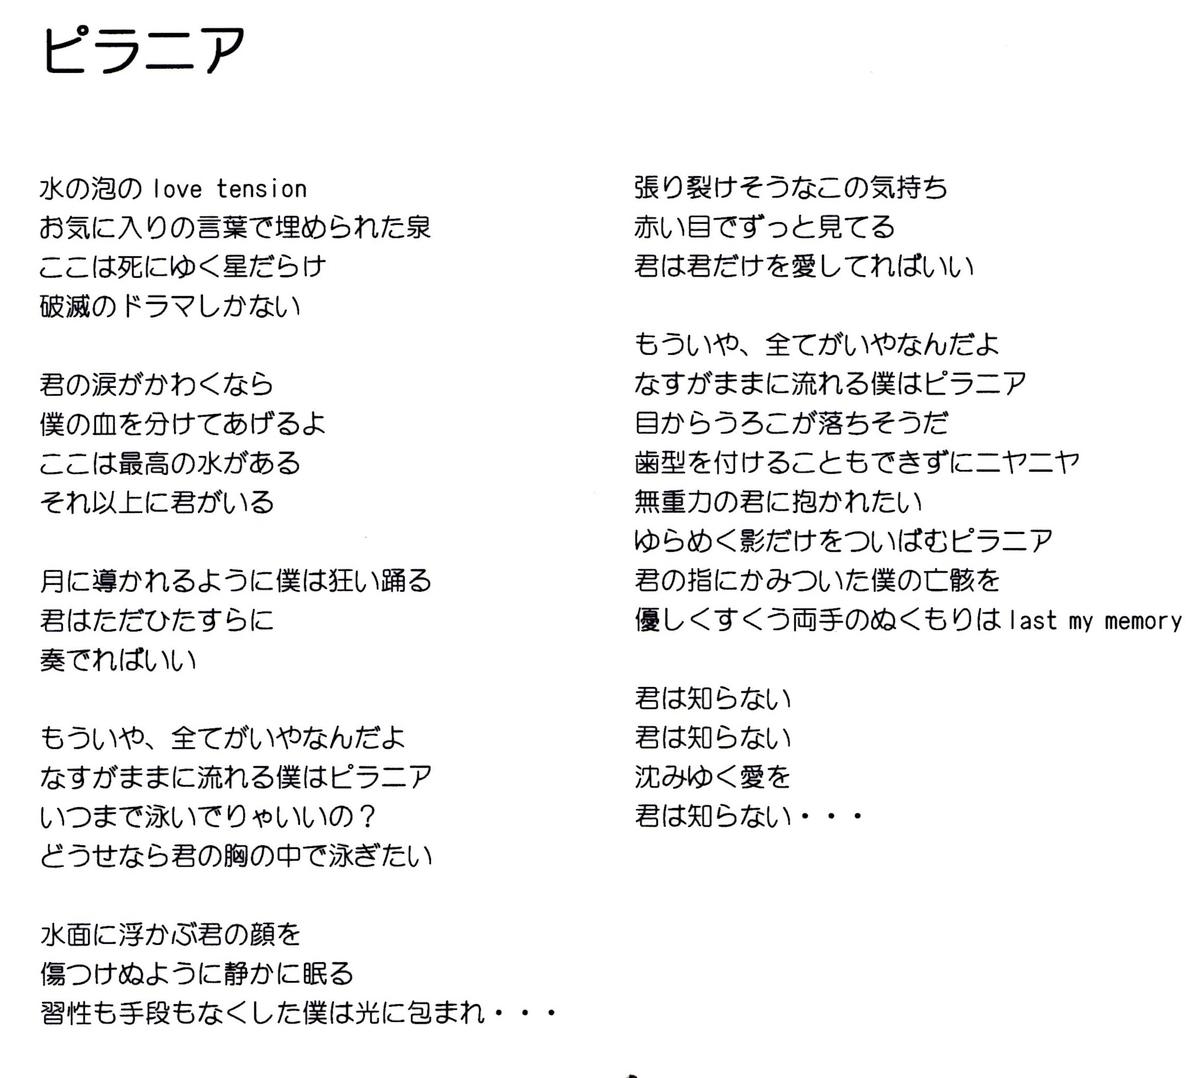 f:id:hamasansu:20200808193427j:plain